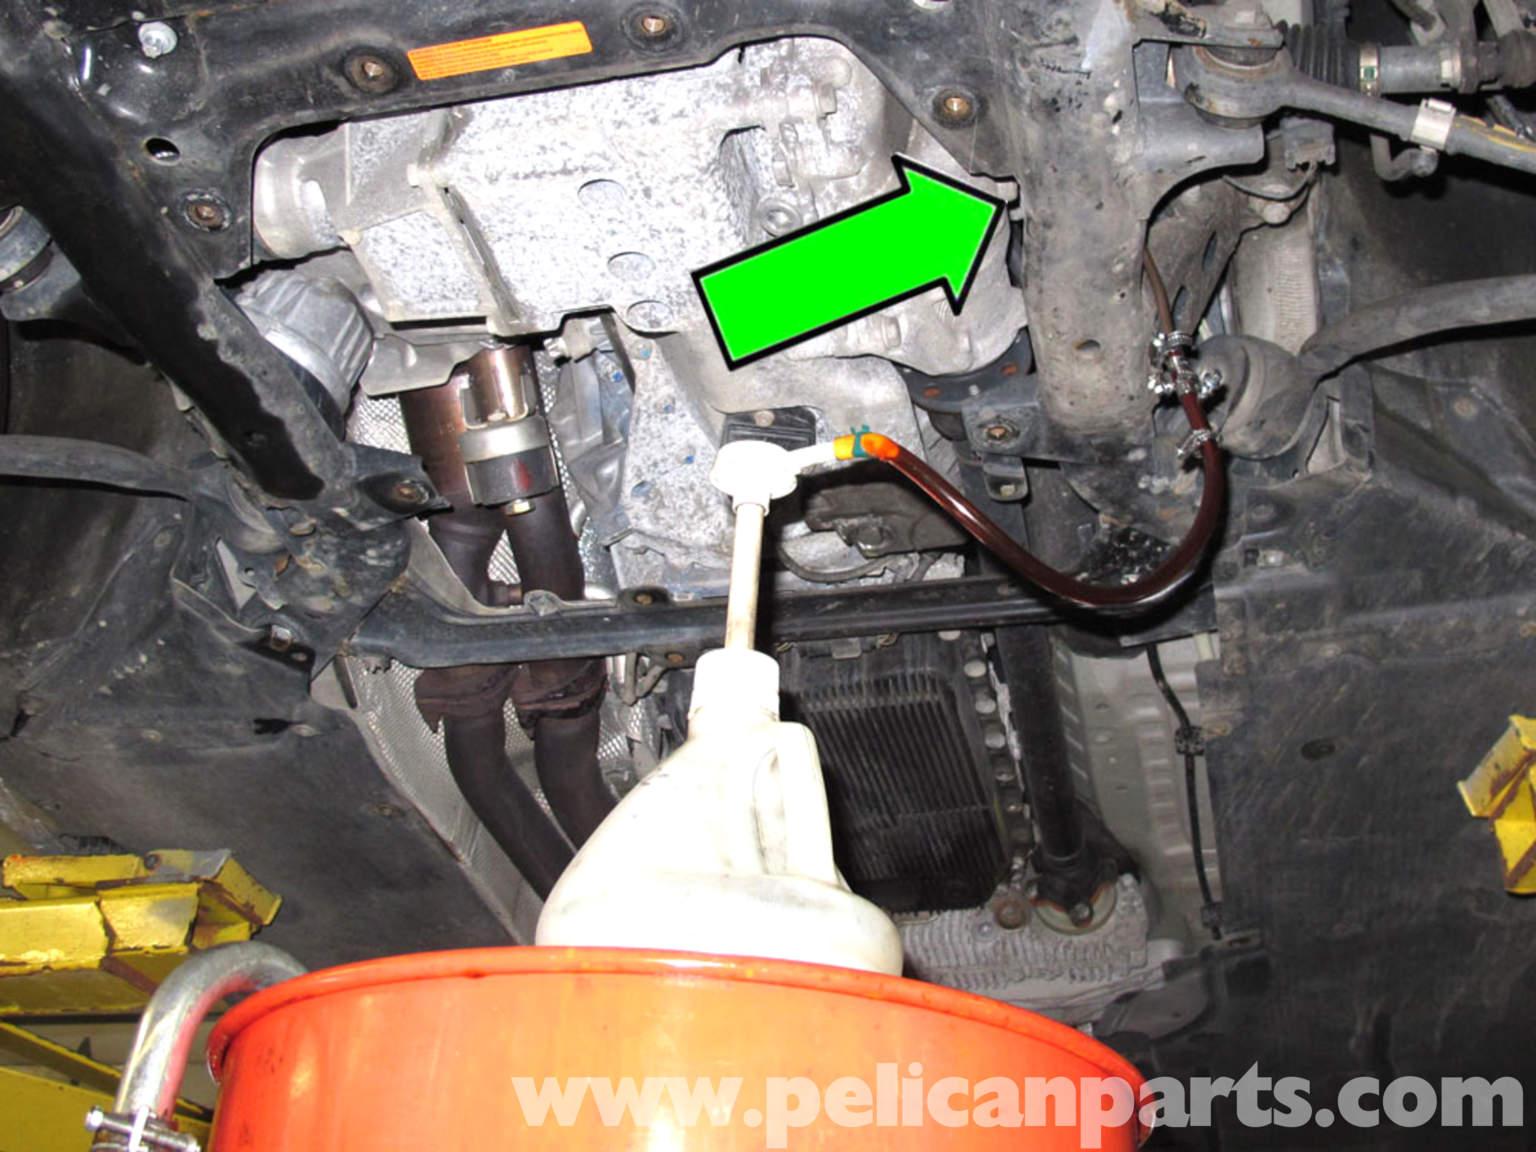 Bmw E90 Rear Differential Fluid Replacement E91 E92